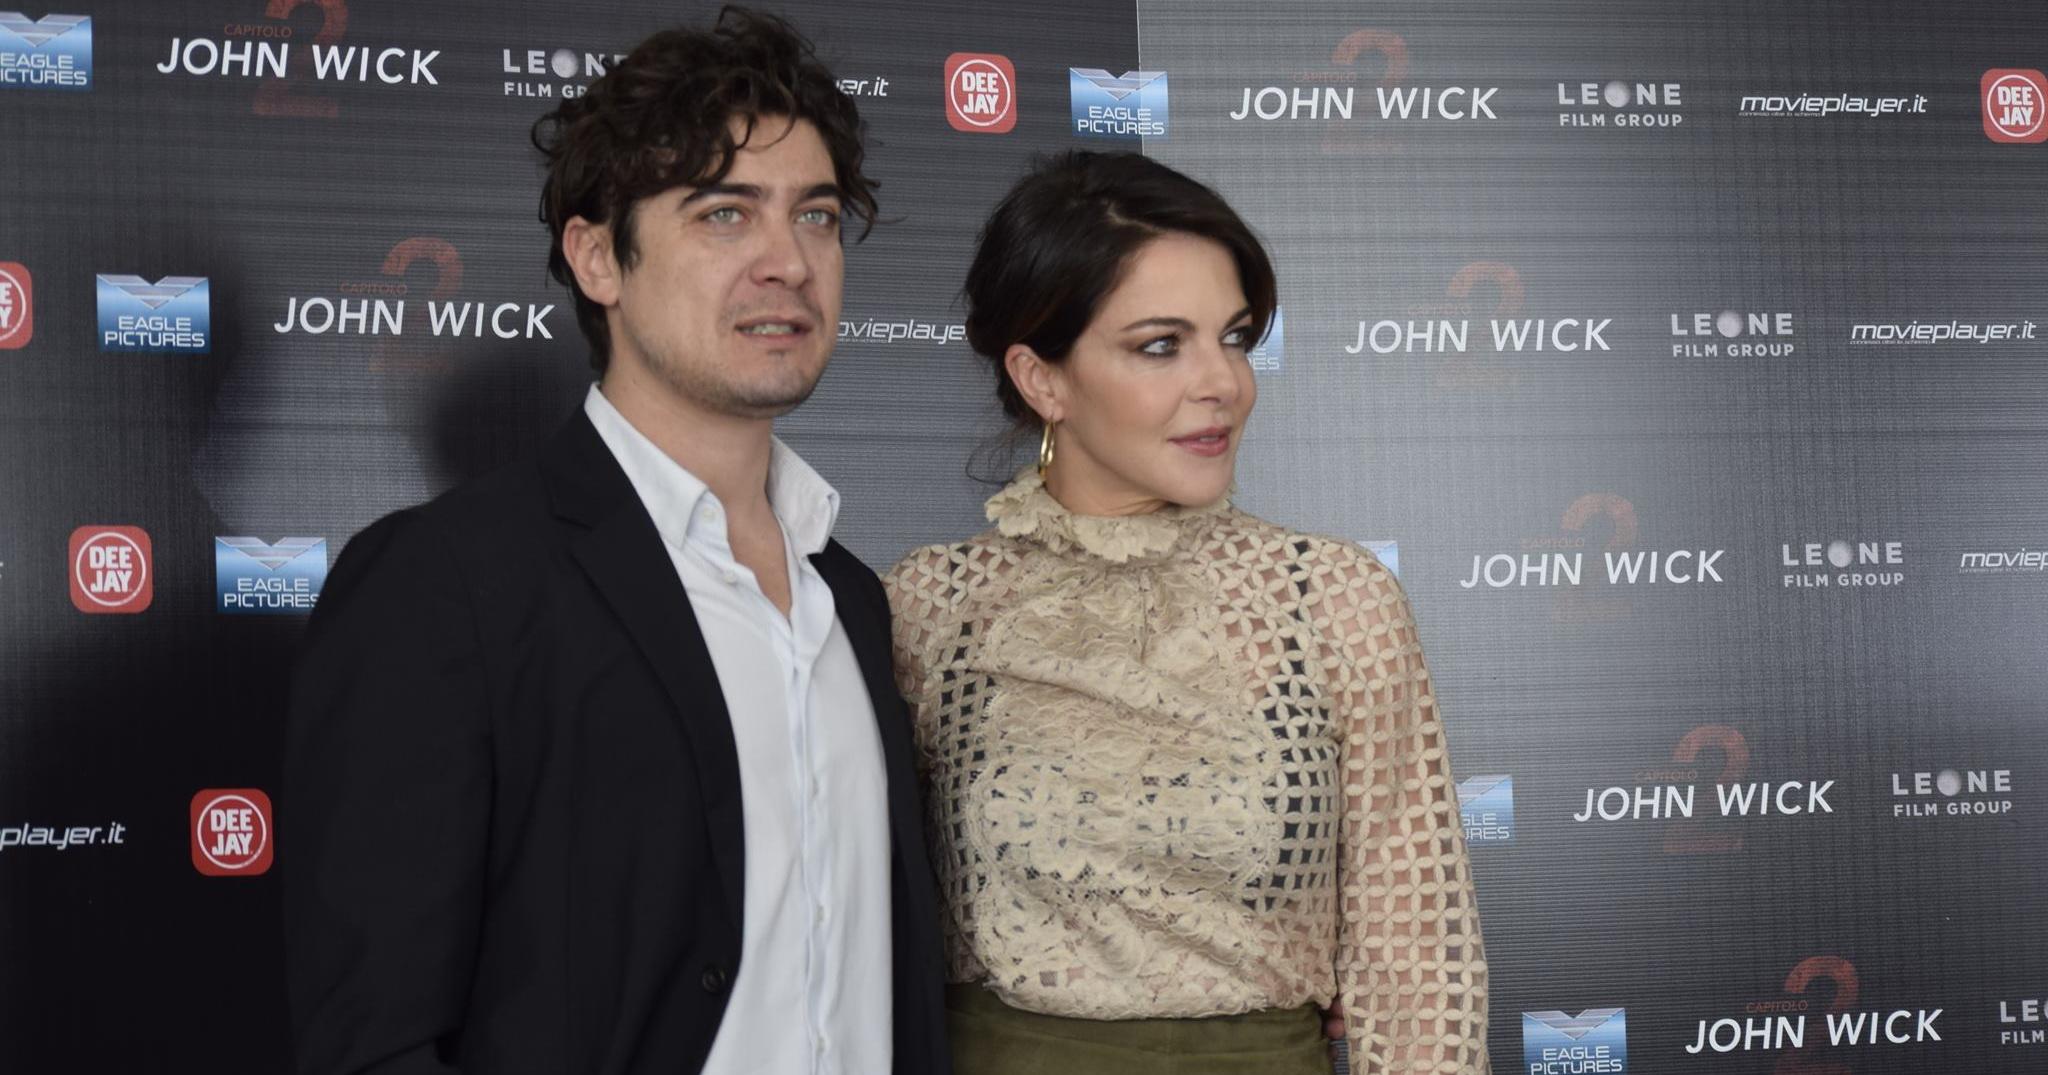 Riccardo Scamarcio e Claudia Gerini - John Wick - Capitolo 2